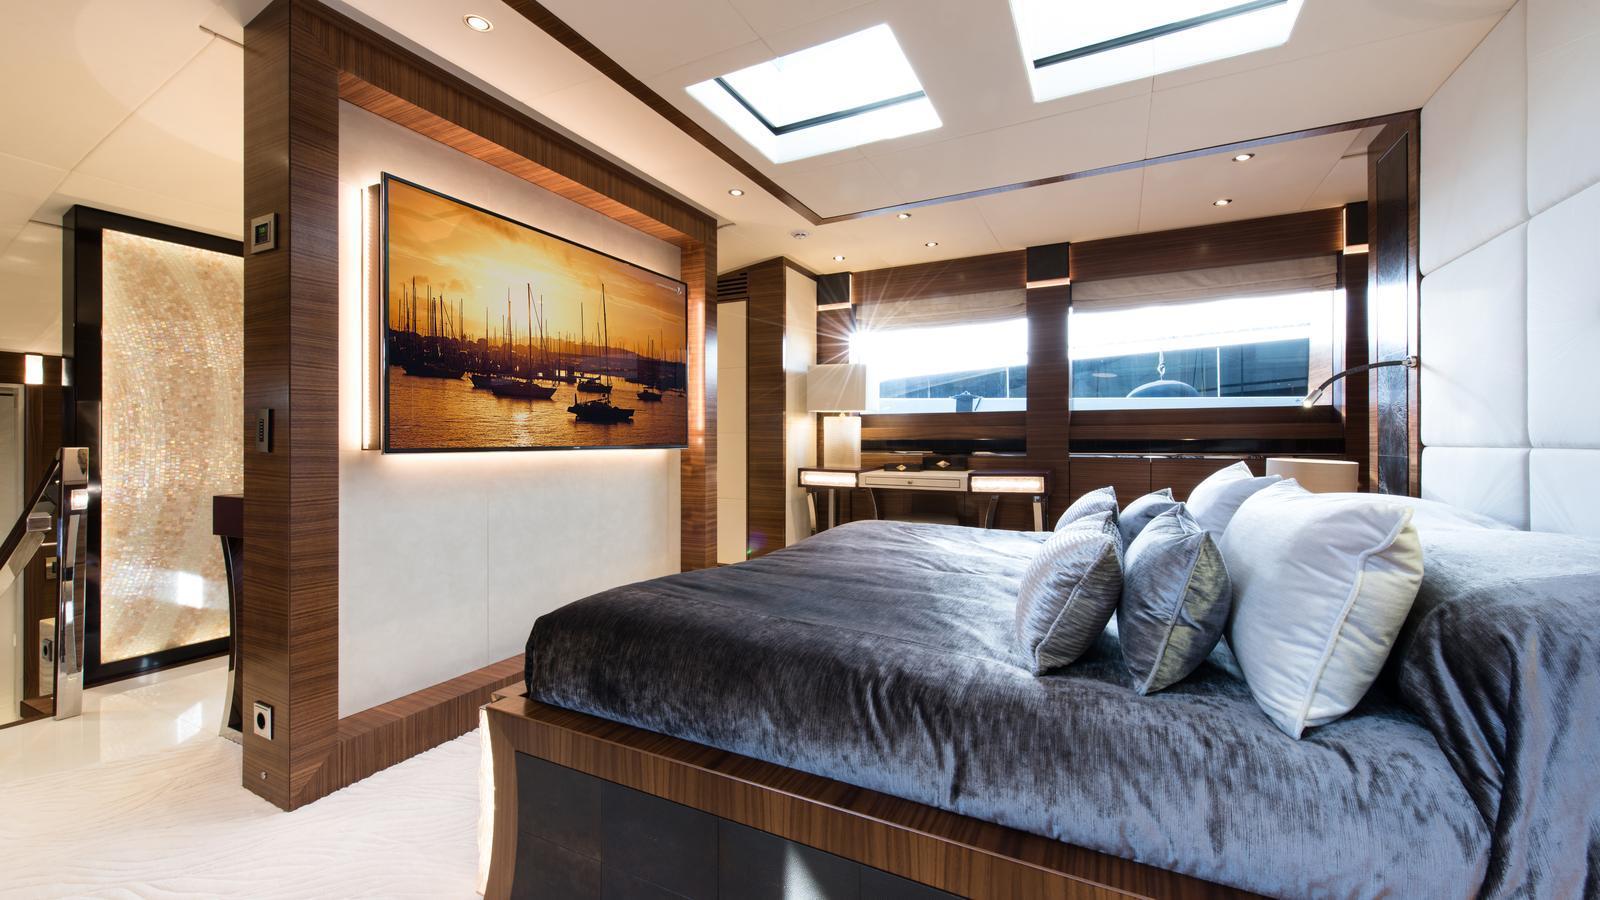 silver-wind-motor-yacht-isa-140-2014-44m-bedroom